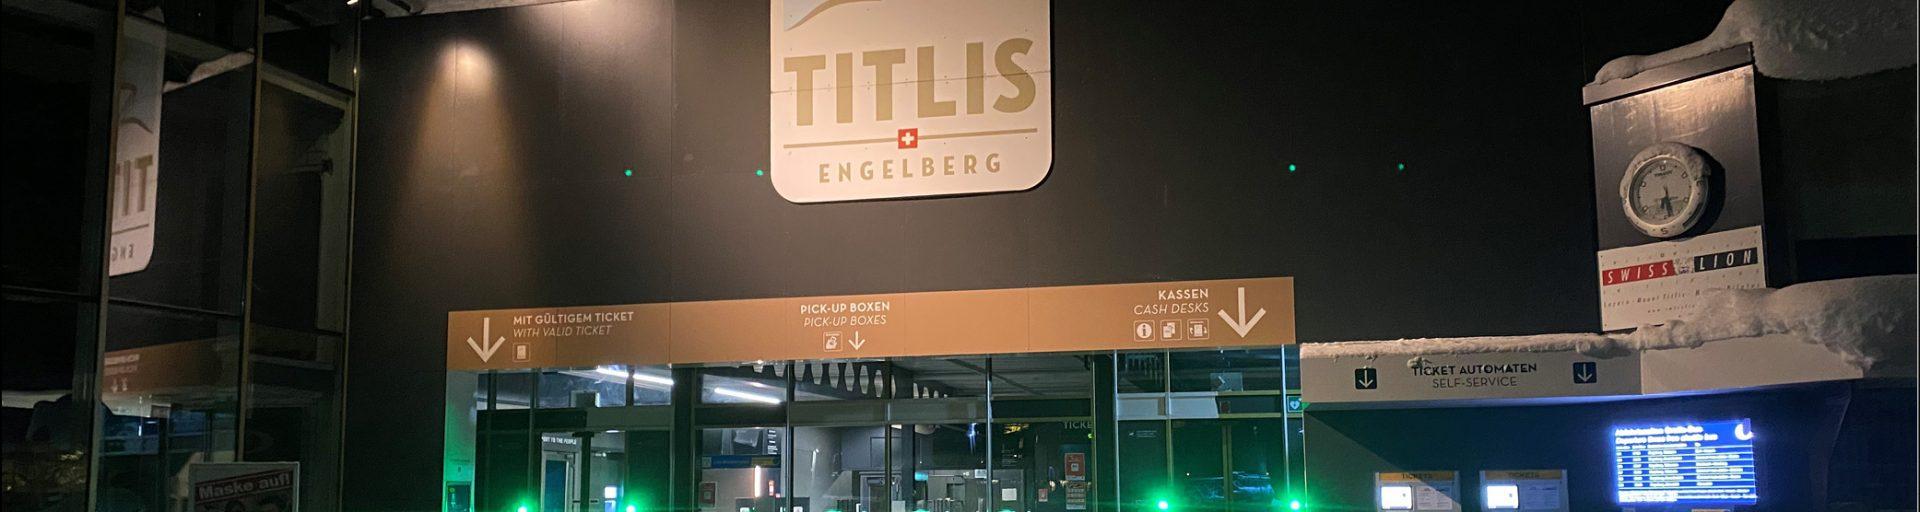 Volvo_Partner_Titlis_Bergbahnen_Leitsystem